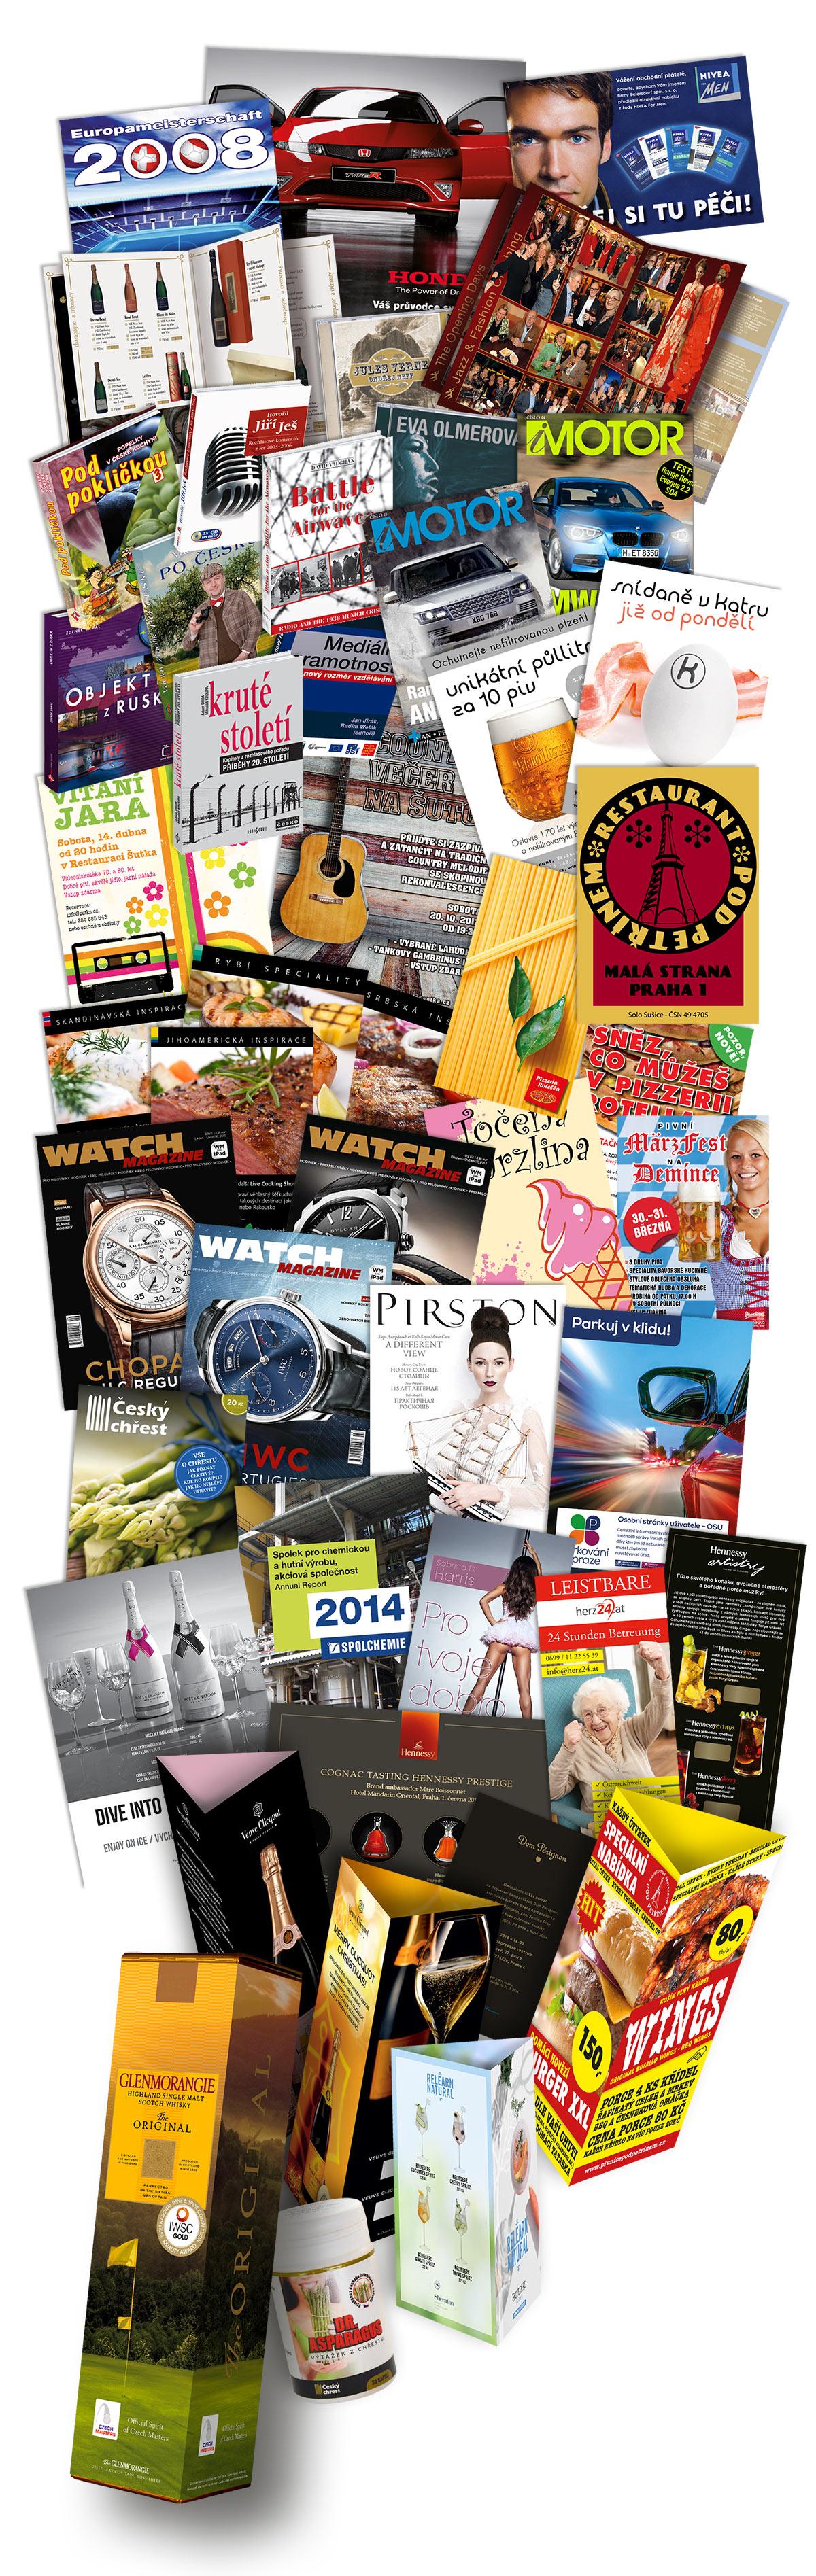 Tiskové materiály tisk grafika grafik leták katalog brožura levně